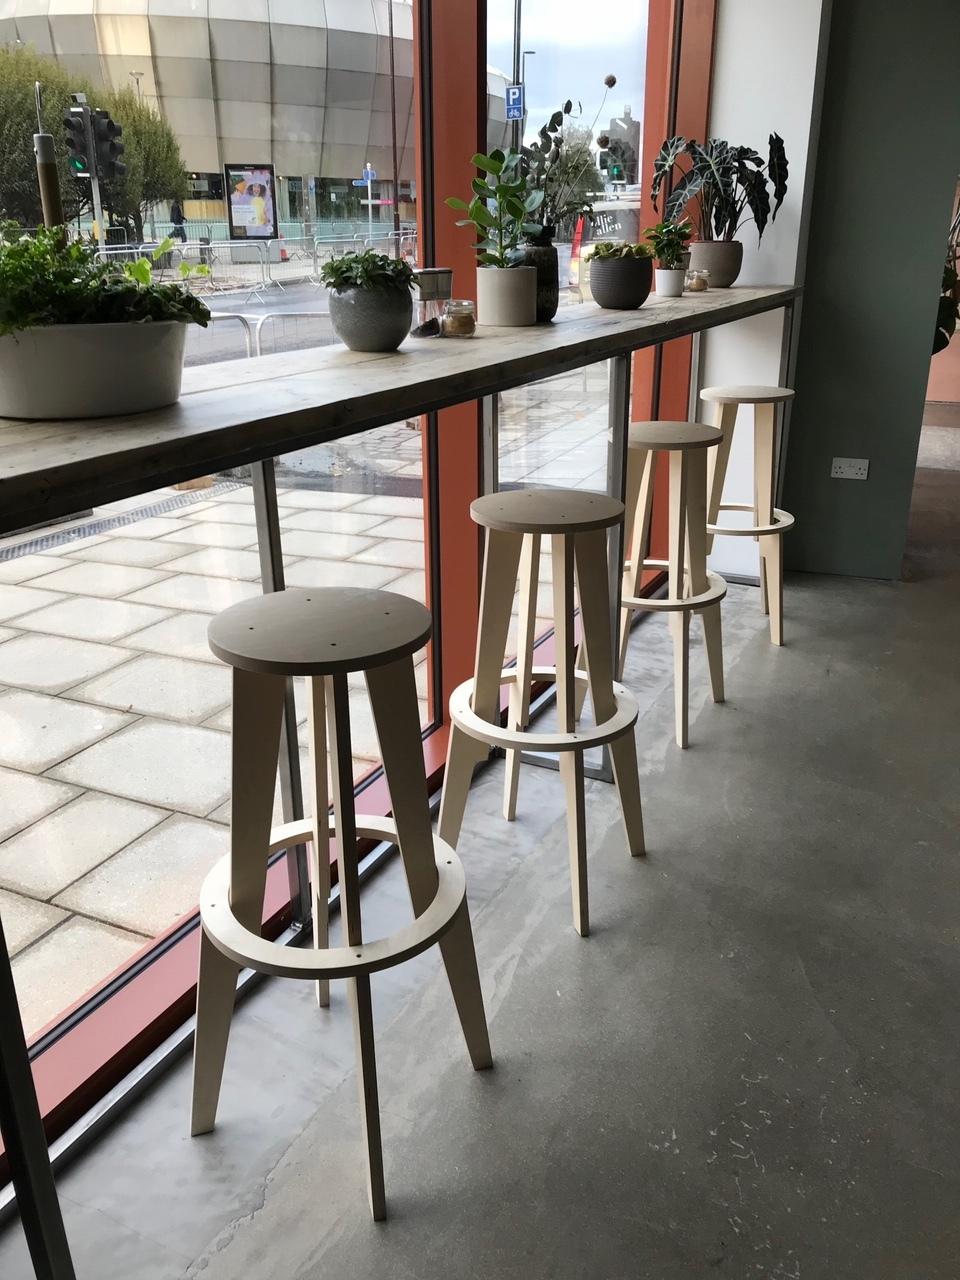 CNC Cut Cafe Stools